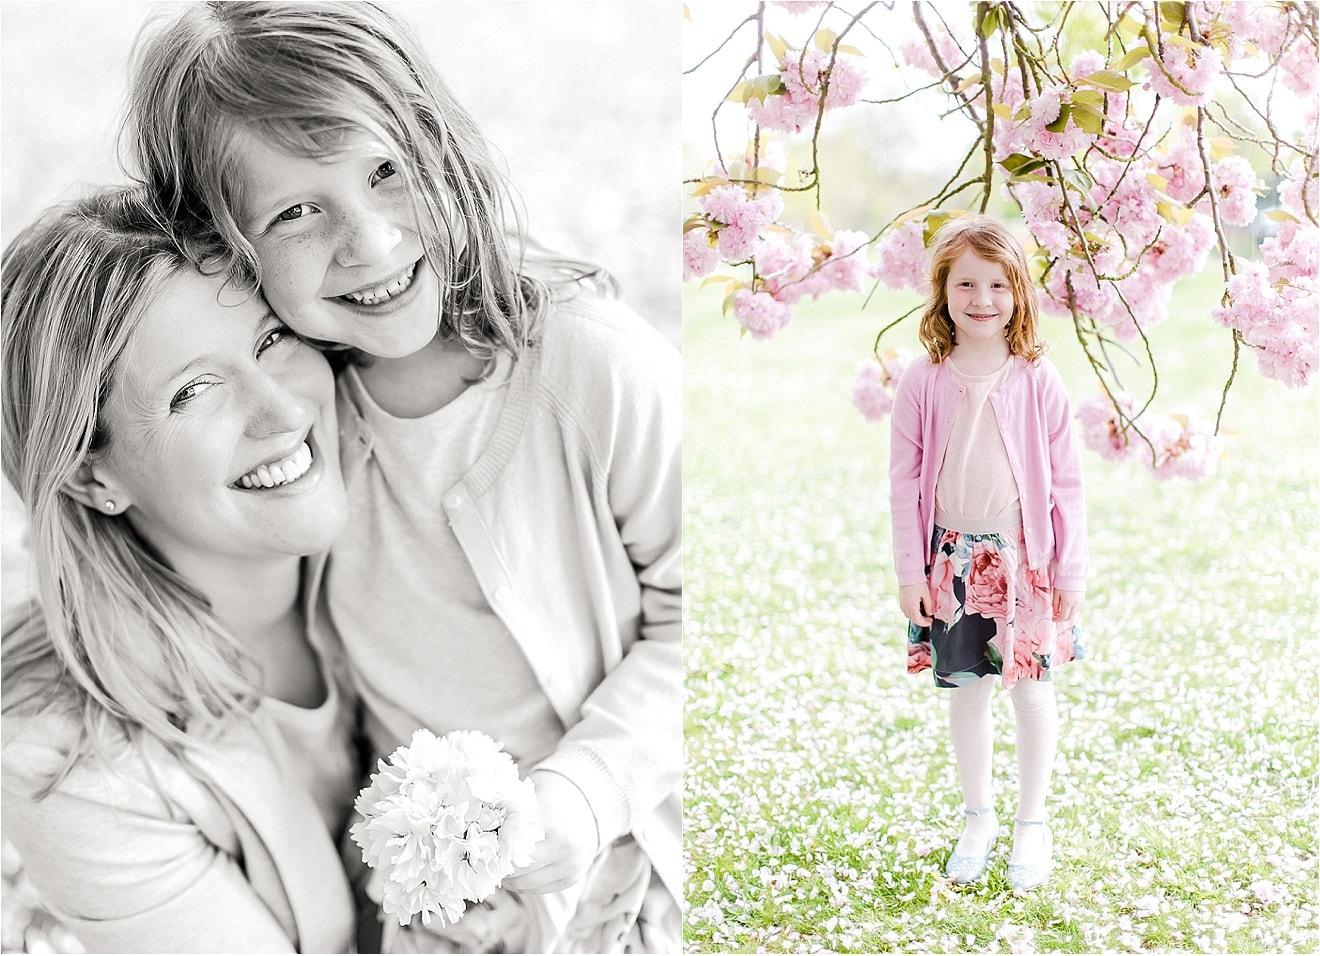 Eddie-Judd-Family-Portrait-Photography014